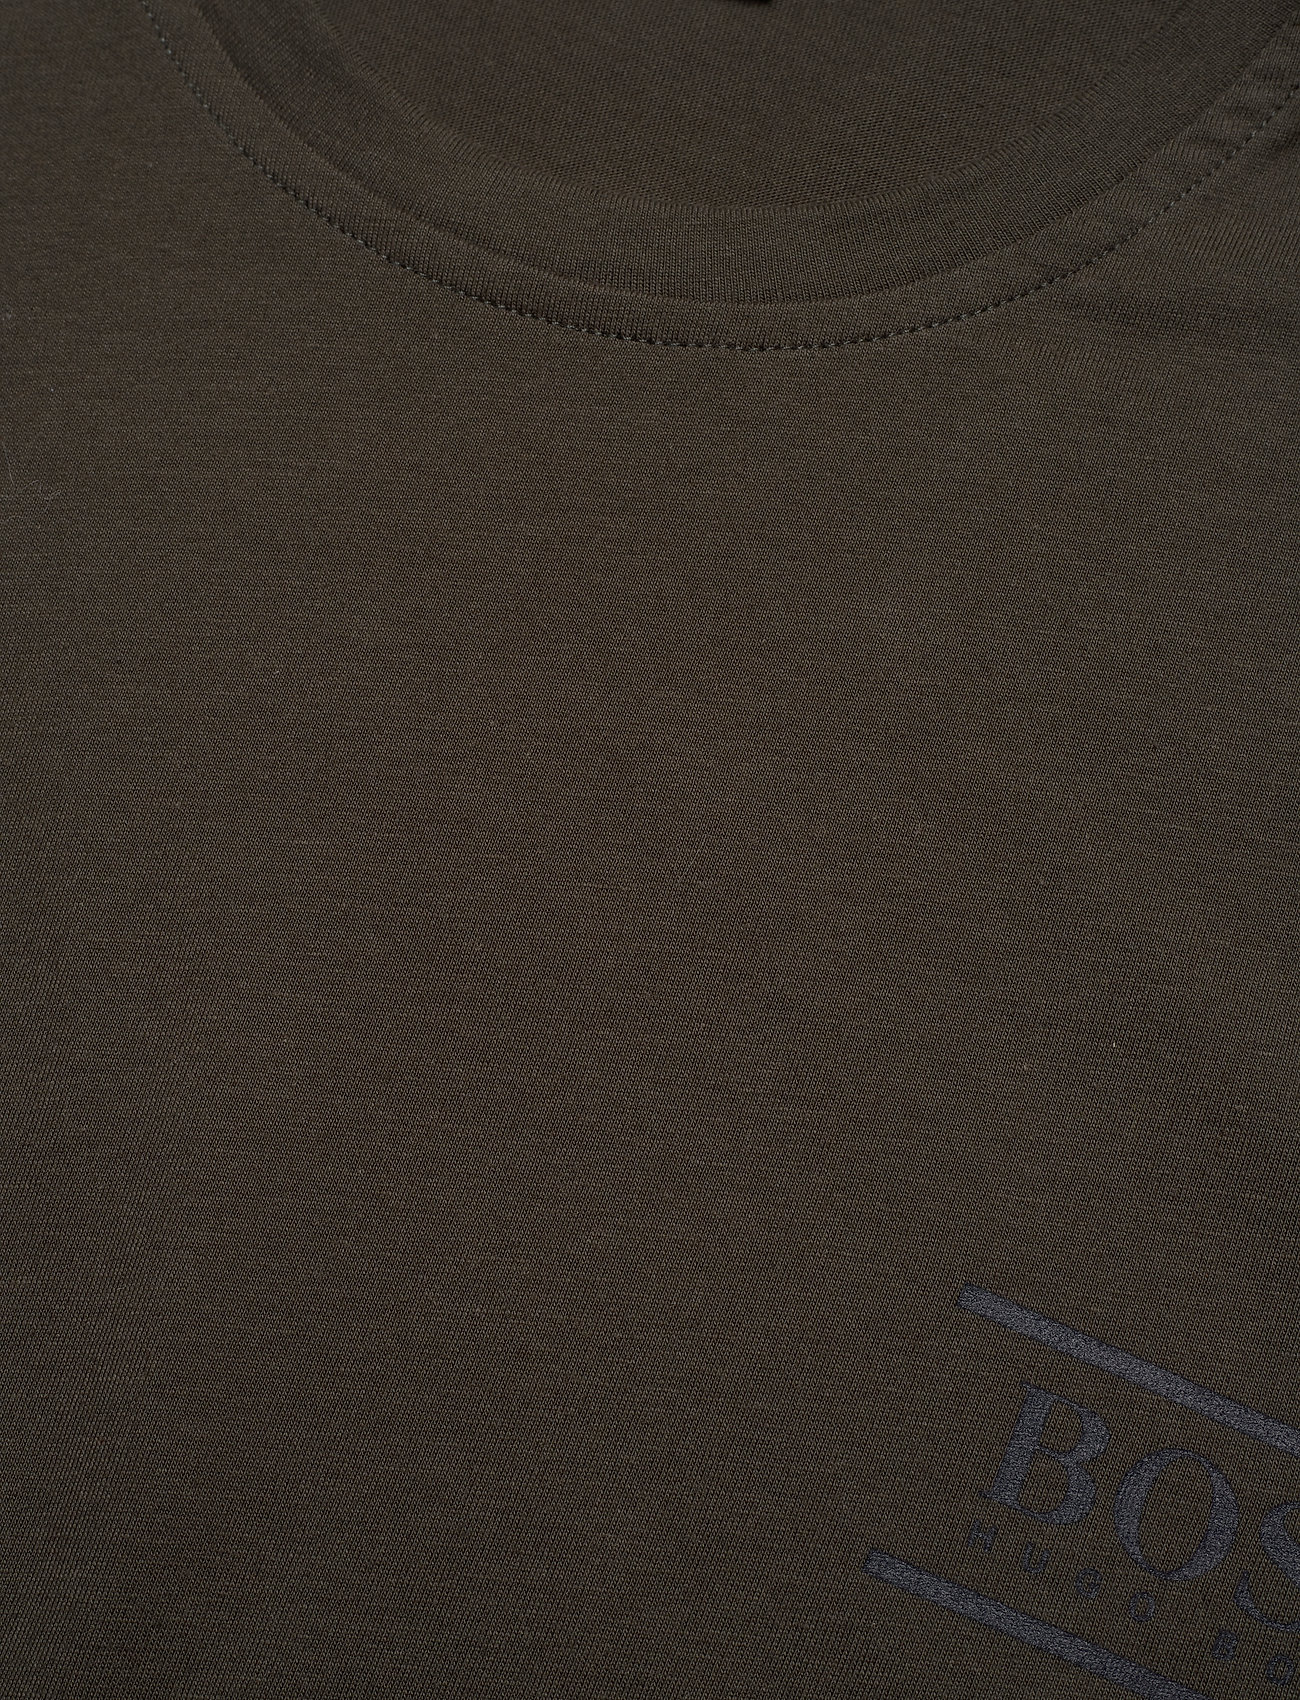 Boss T-shirt Rn 24 - T-shirts Dark Green